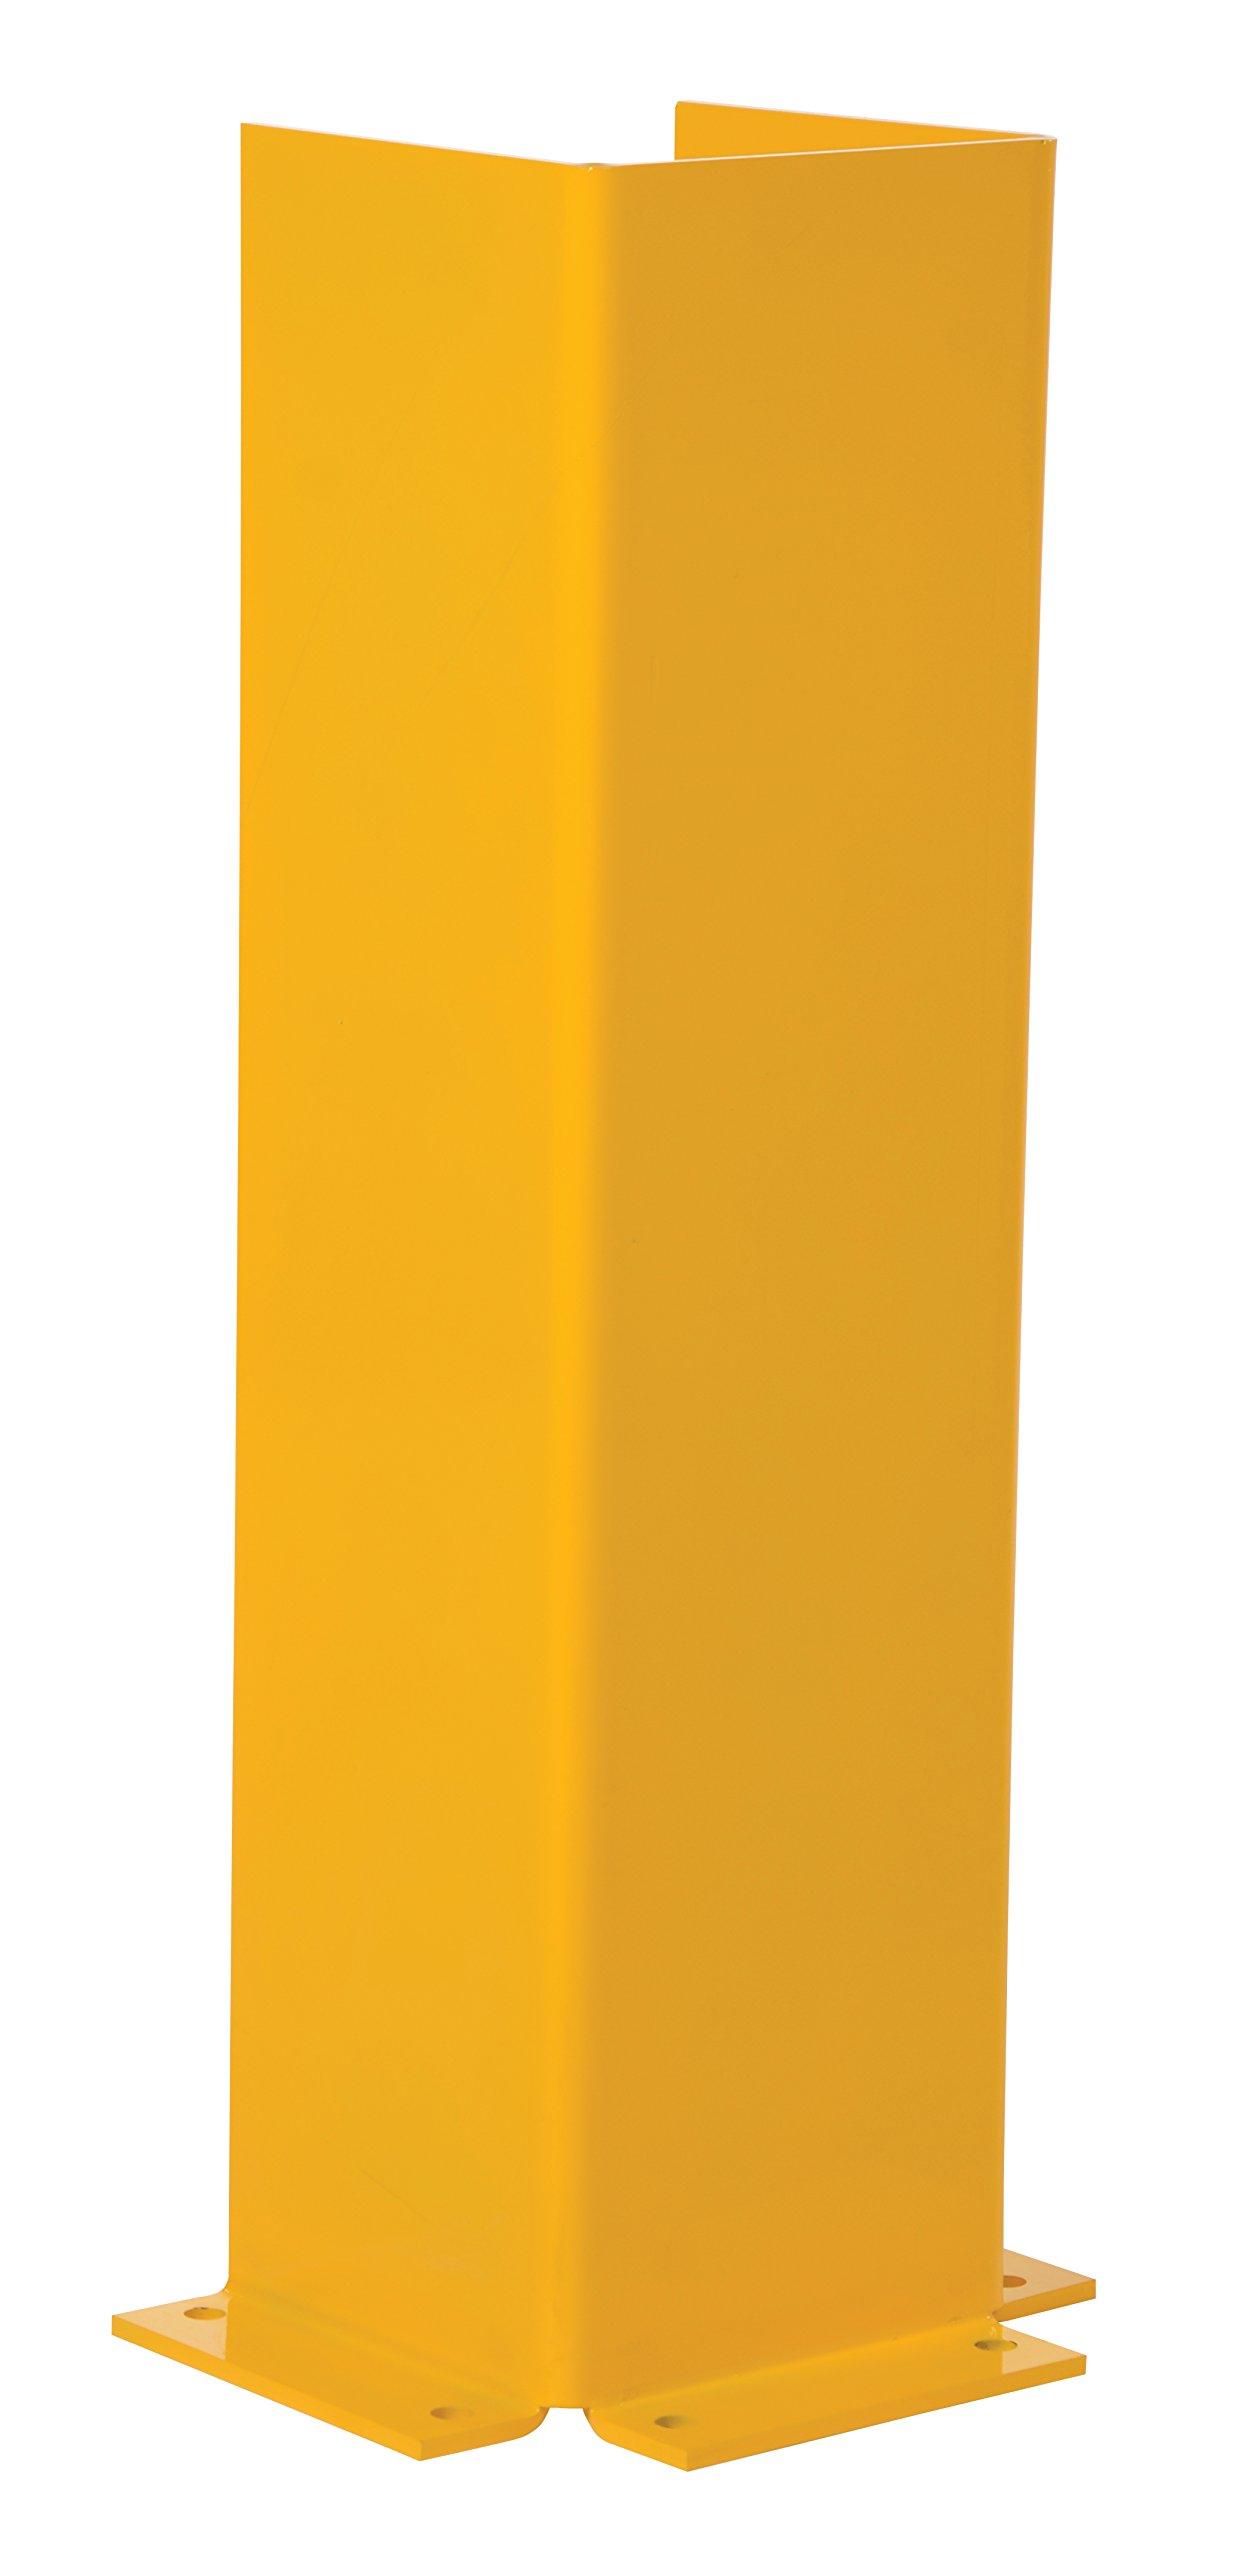 Vestil CG-42 Gantry/Jib Column Guard Protector, Steel, 10-1/2'' Inside Width, 42'' Overall Height, 10'' Inside Depth by Vestil